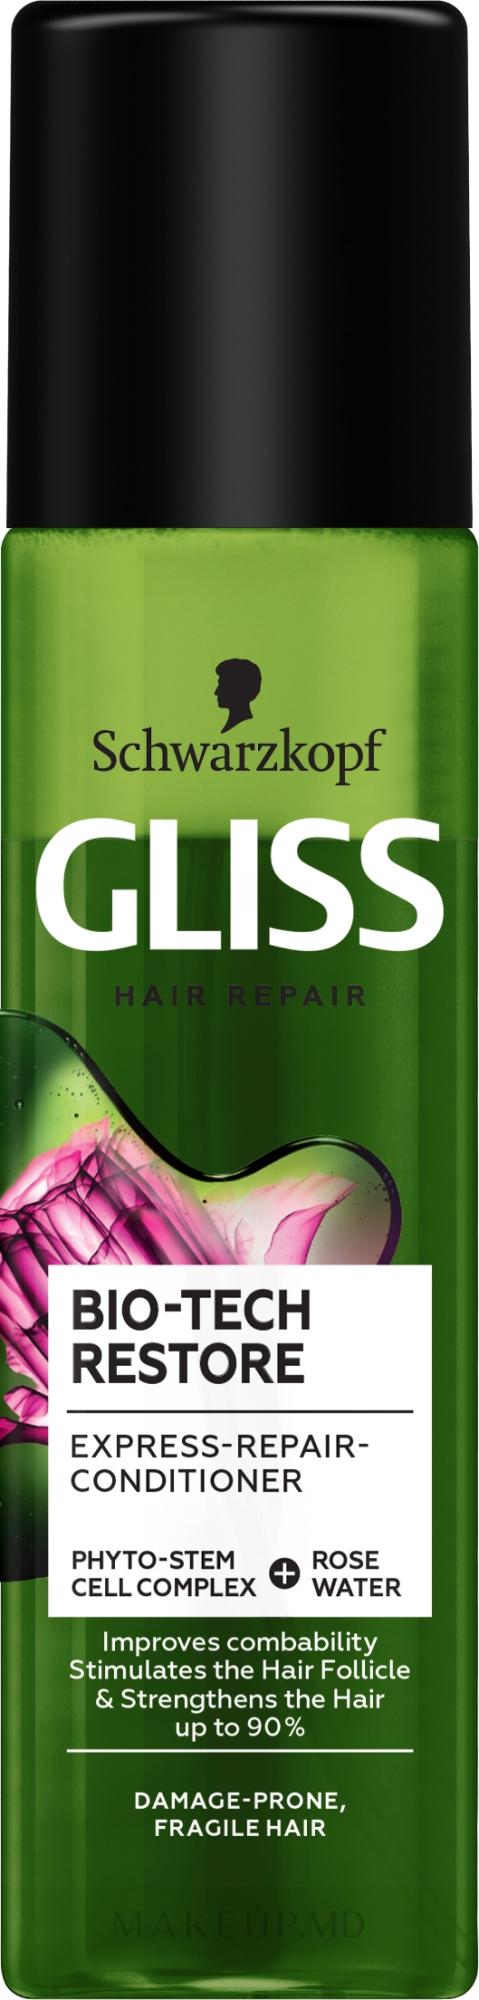 Balsam-spray de păr - Schwarzkopf Gliss Kur Bio-Tech Restore — Imagine 200 ml